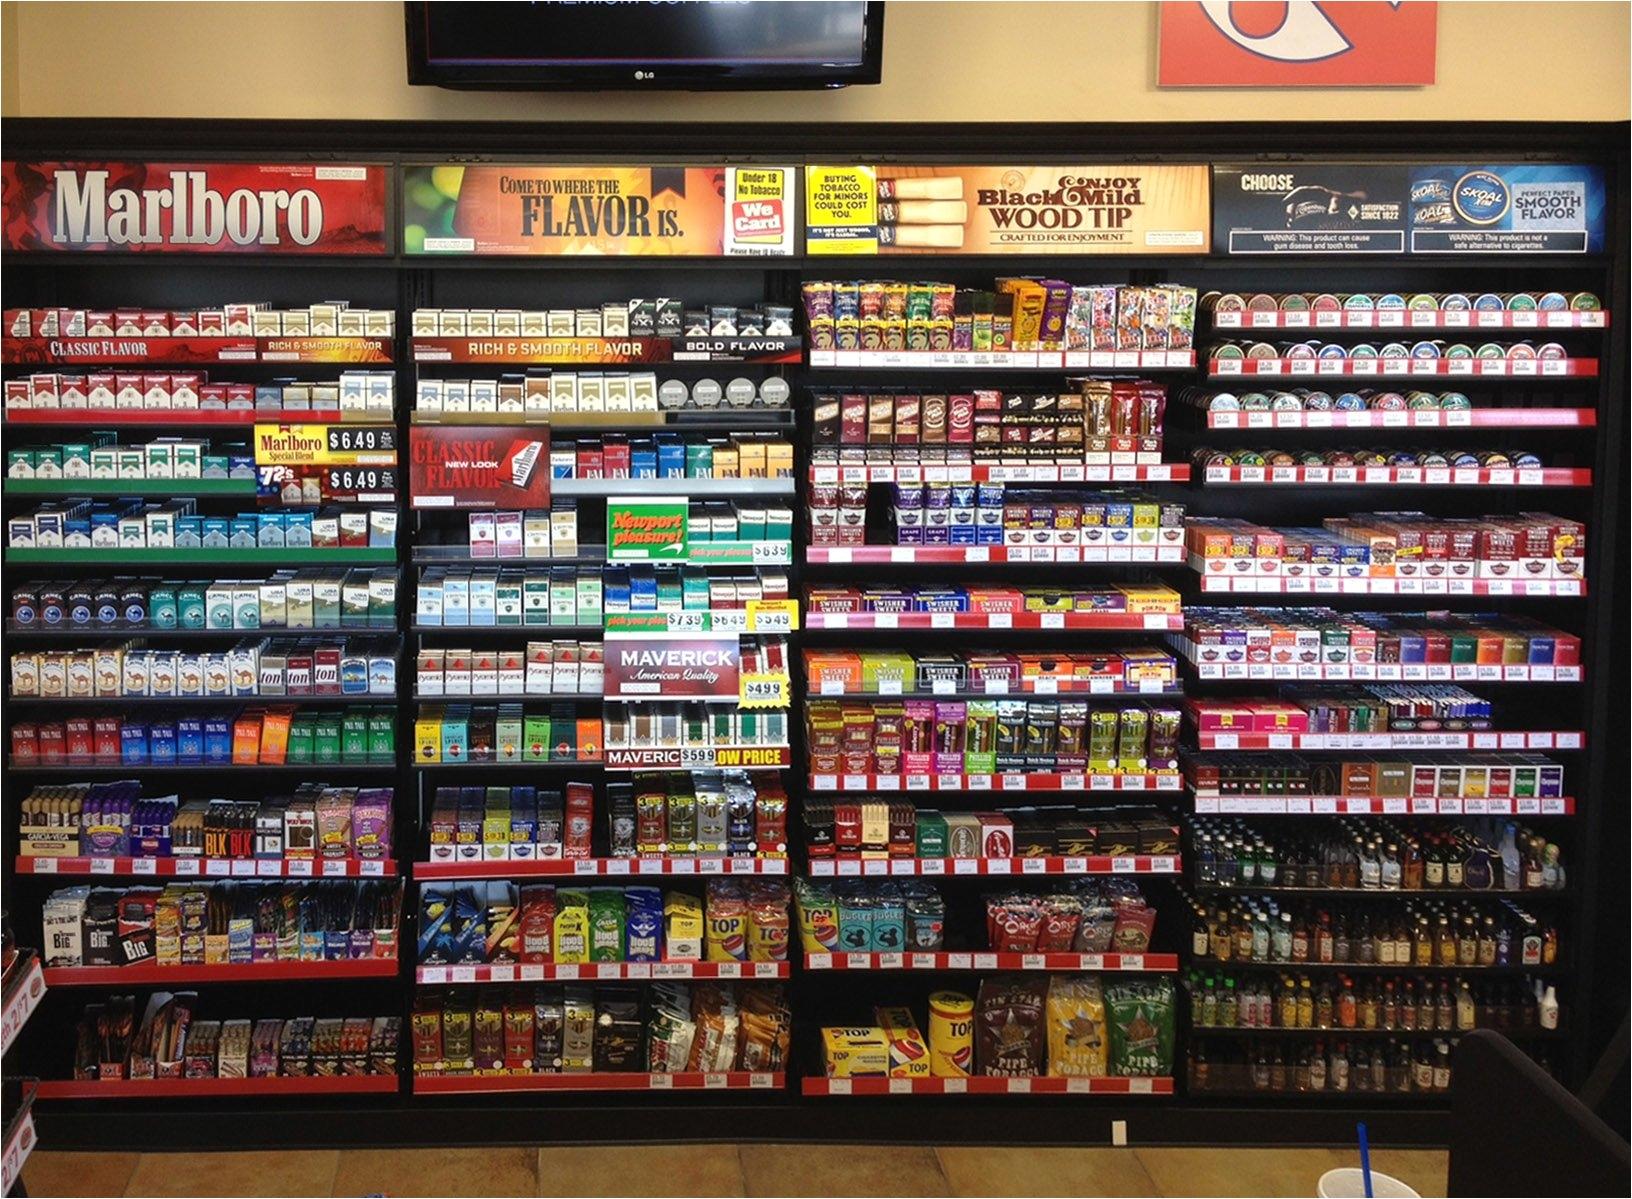 Overhead Cigarette Racks Cigarette Racks for Convenience Stores Creative Display Works